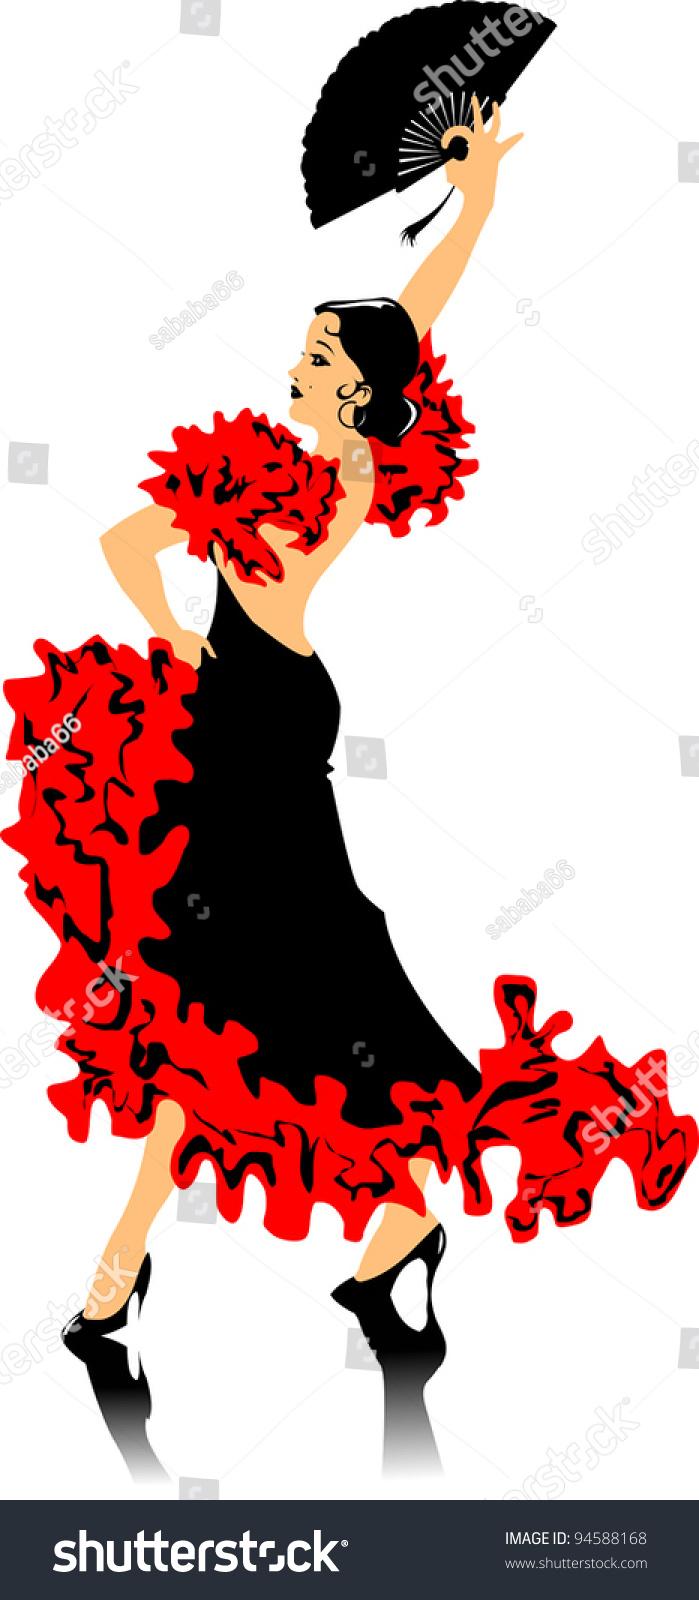 dancer black dress dancing flamenco illustration stock vector